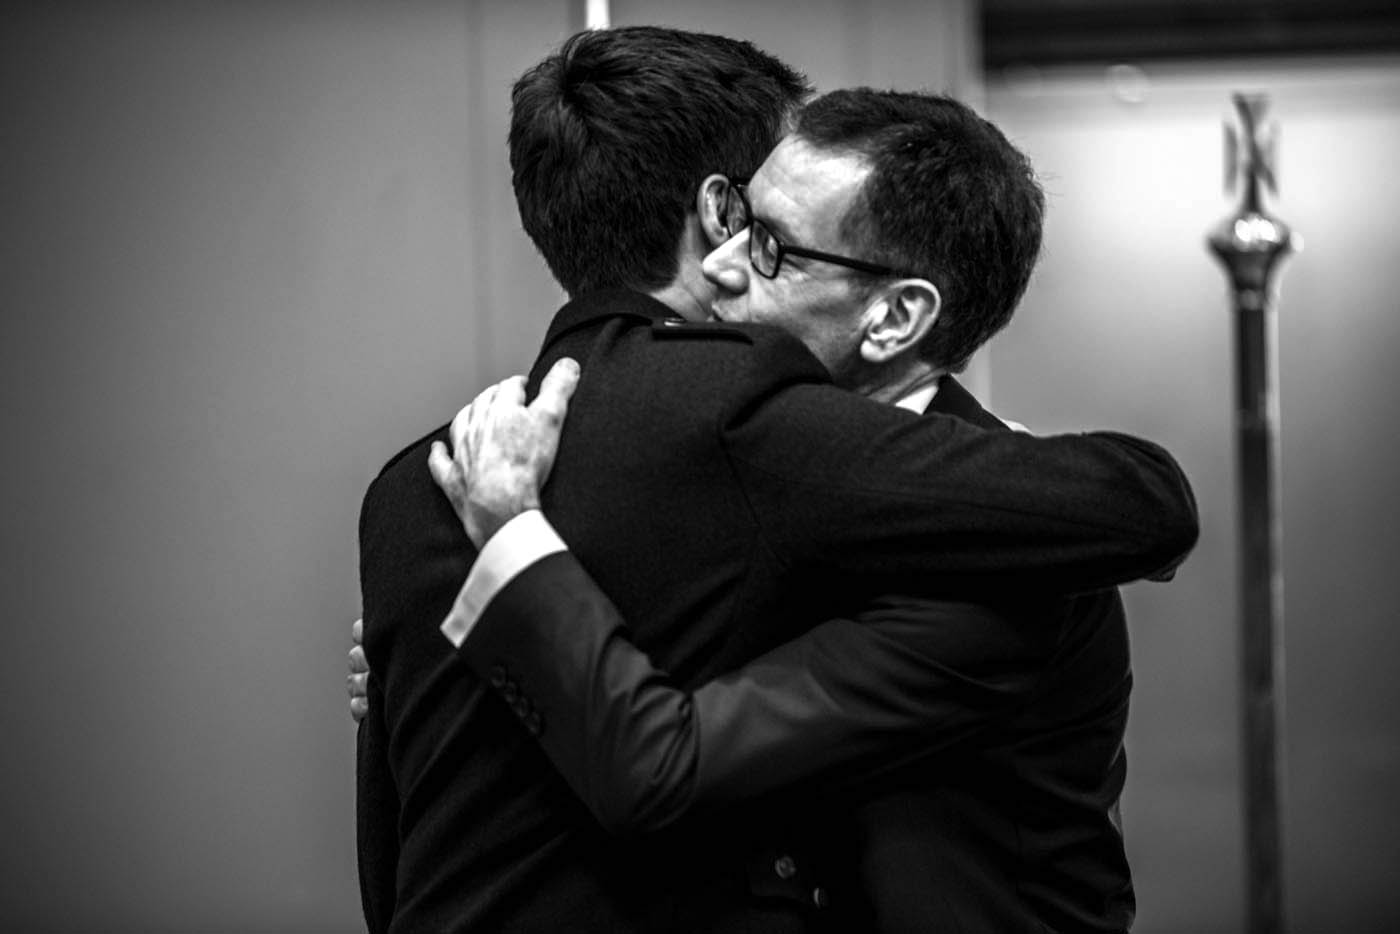 GROOM-HUGS-FATHER.jpg